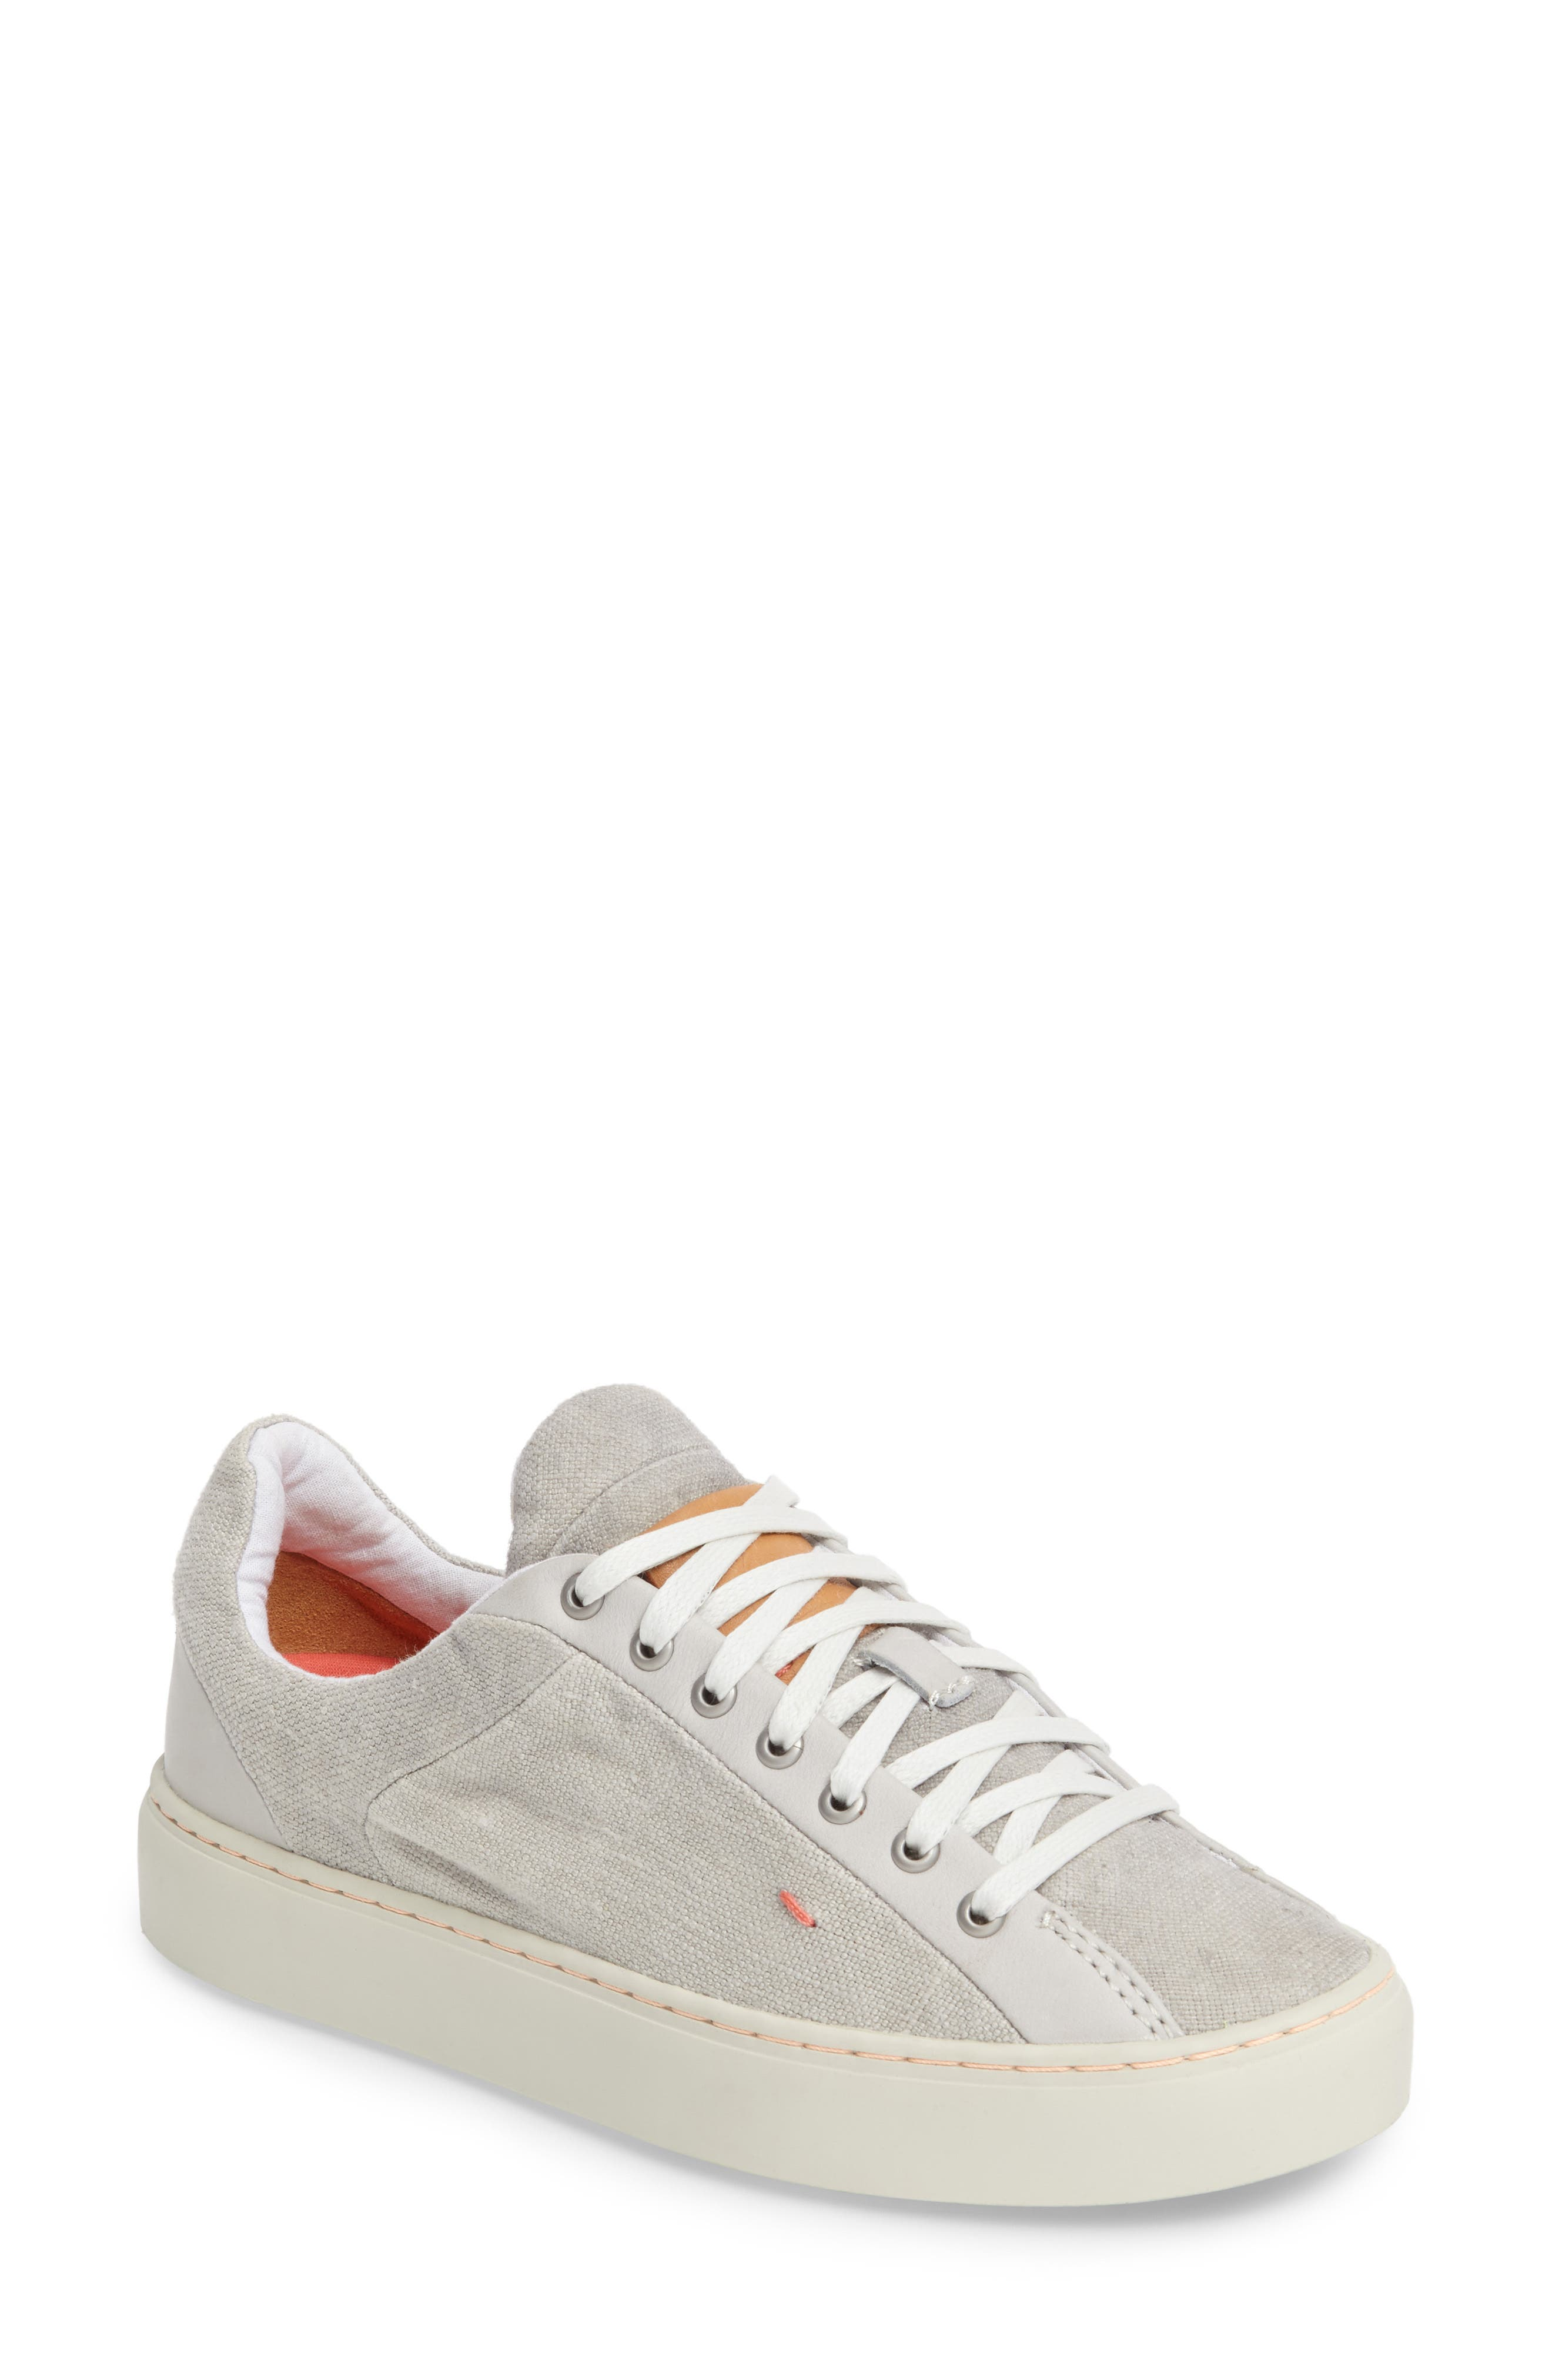 Somerville Sneaker,                         Main,                         color, CONCRETE FABRIC